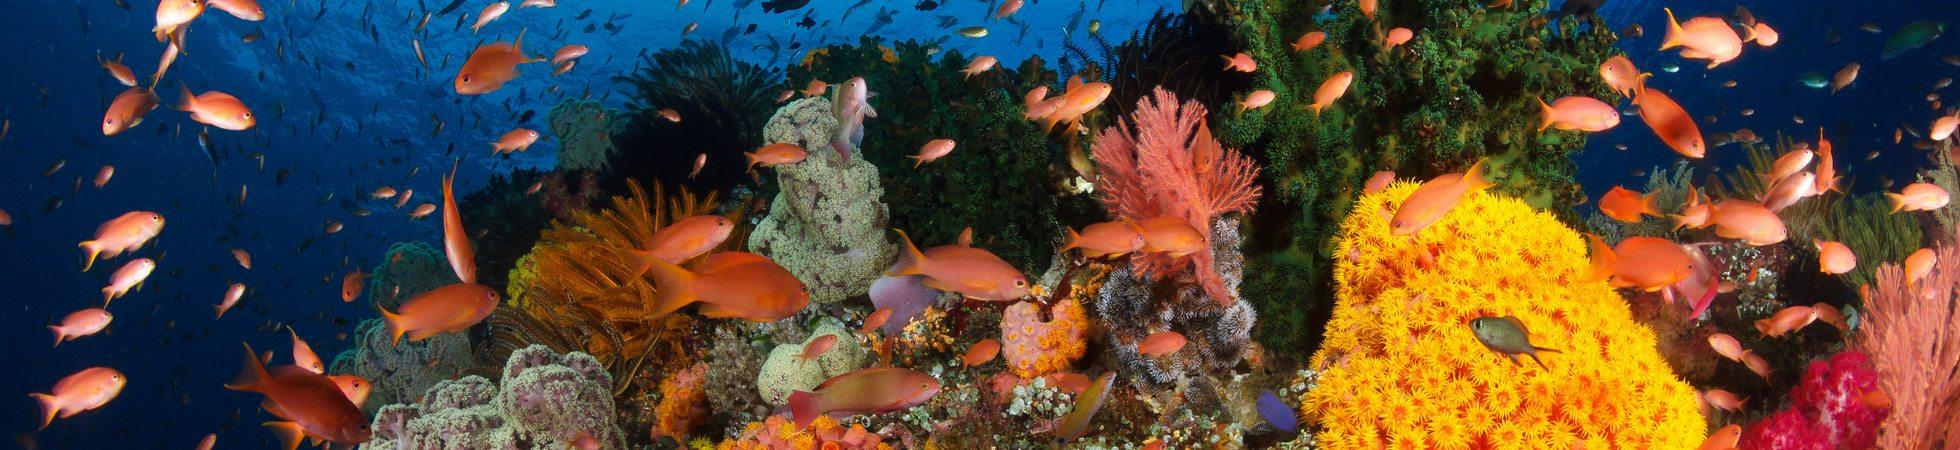 Amazing rajaampat | Amazing Dive